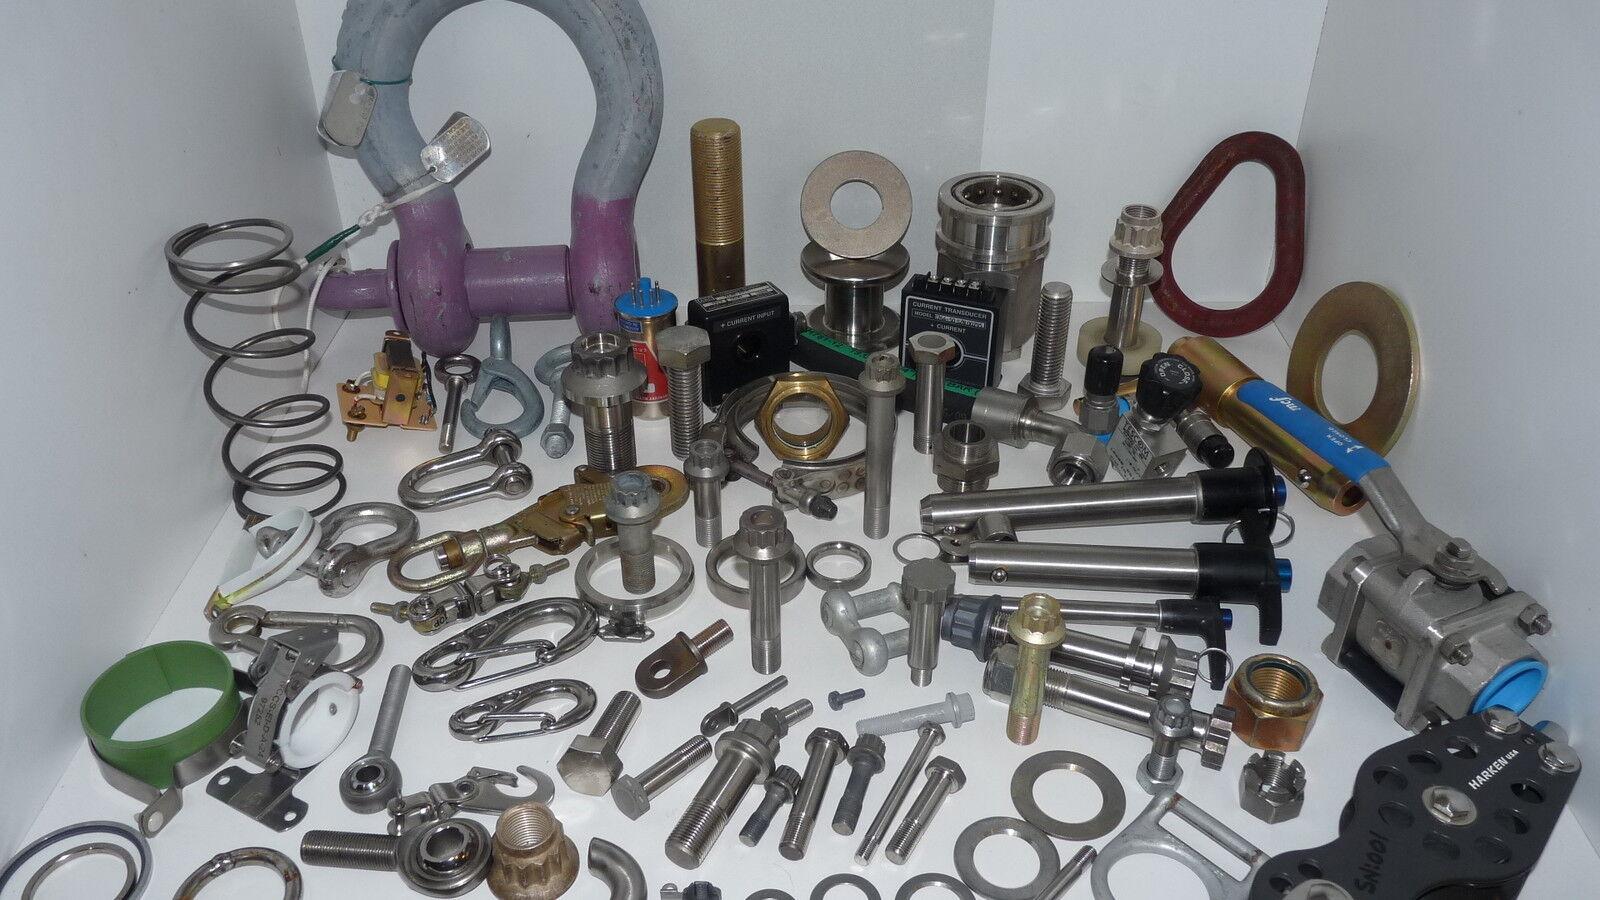 scs-tool